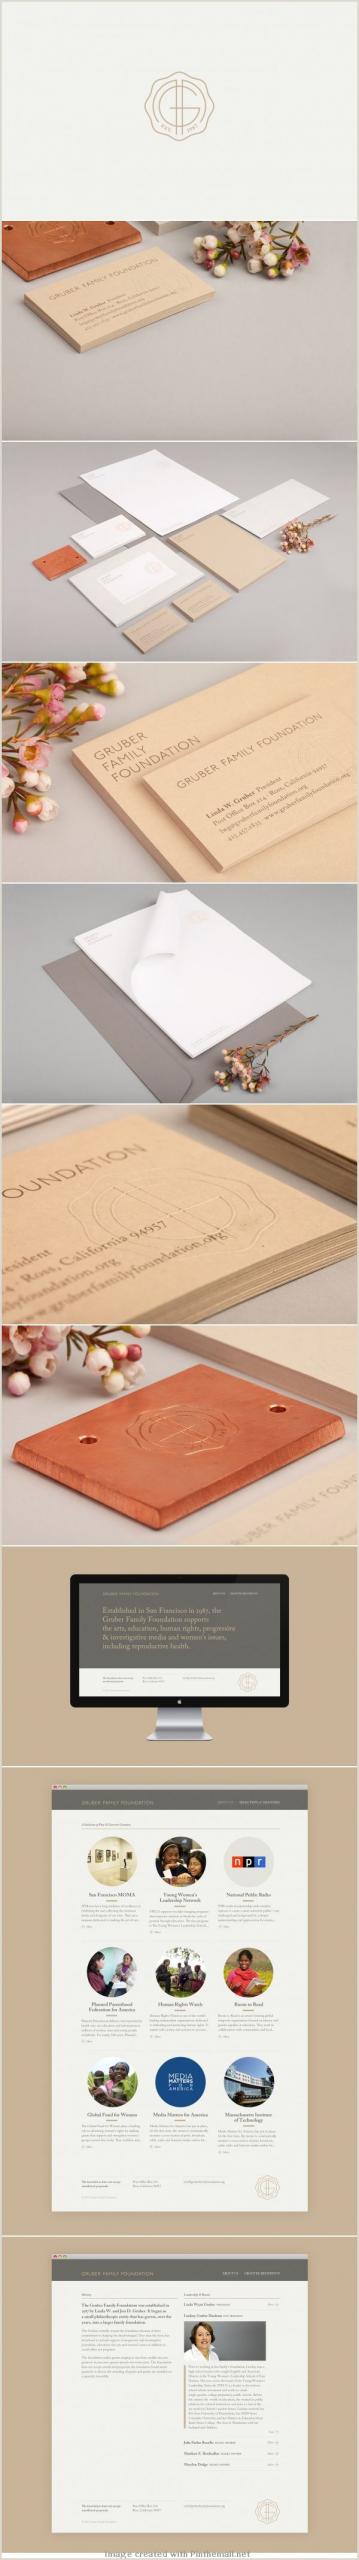 Creating A Business Card 14 Popular Hardwood Flooring Business Card Template